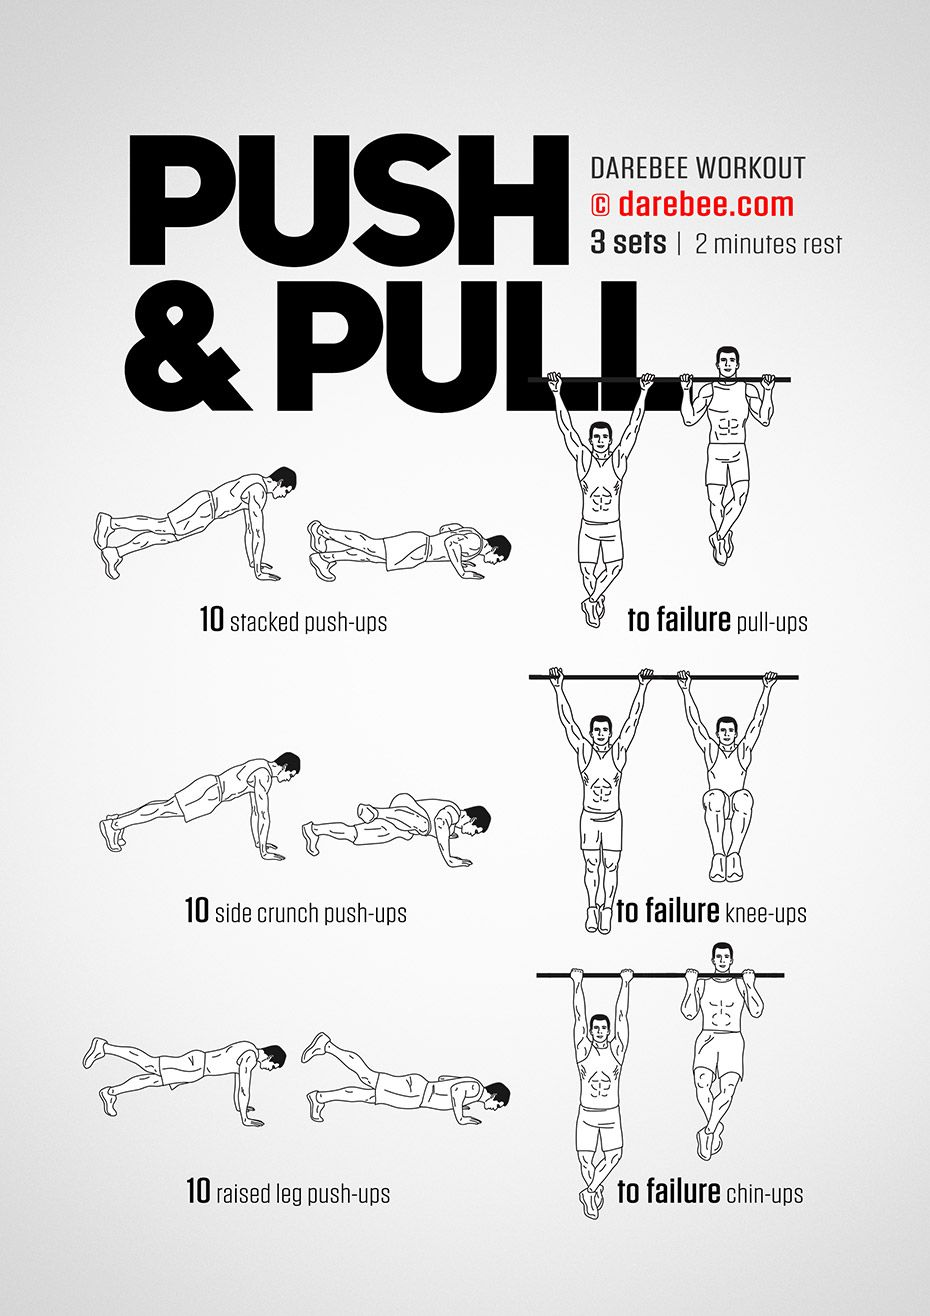 Push Amp Pull Workout Push Pull Workout Pull Up Workout Push Workout